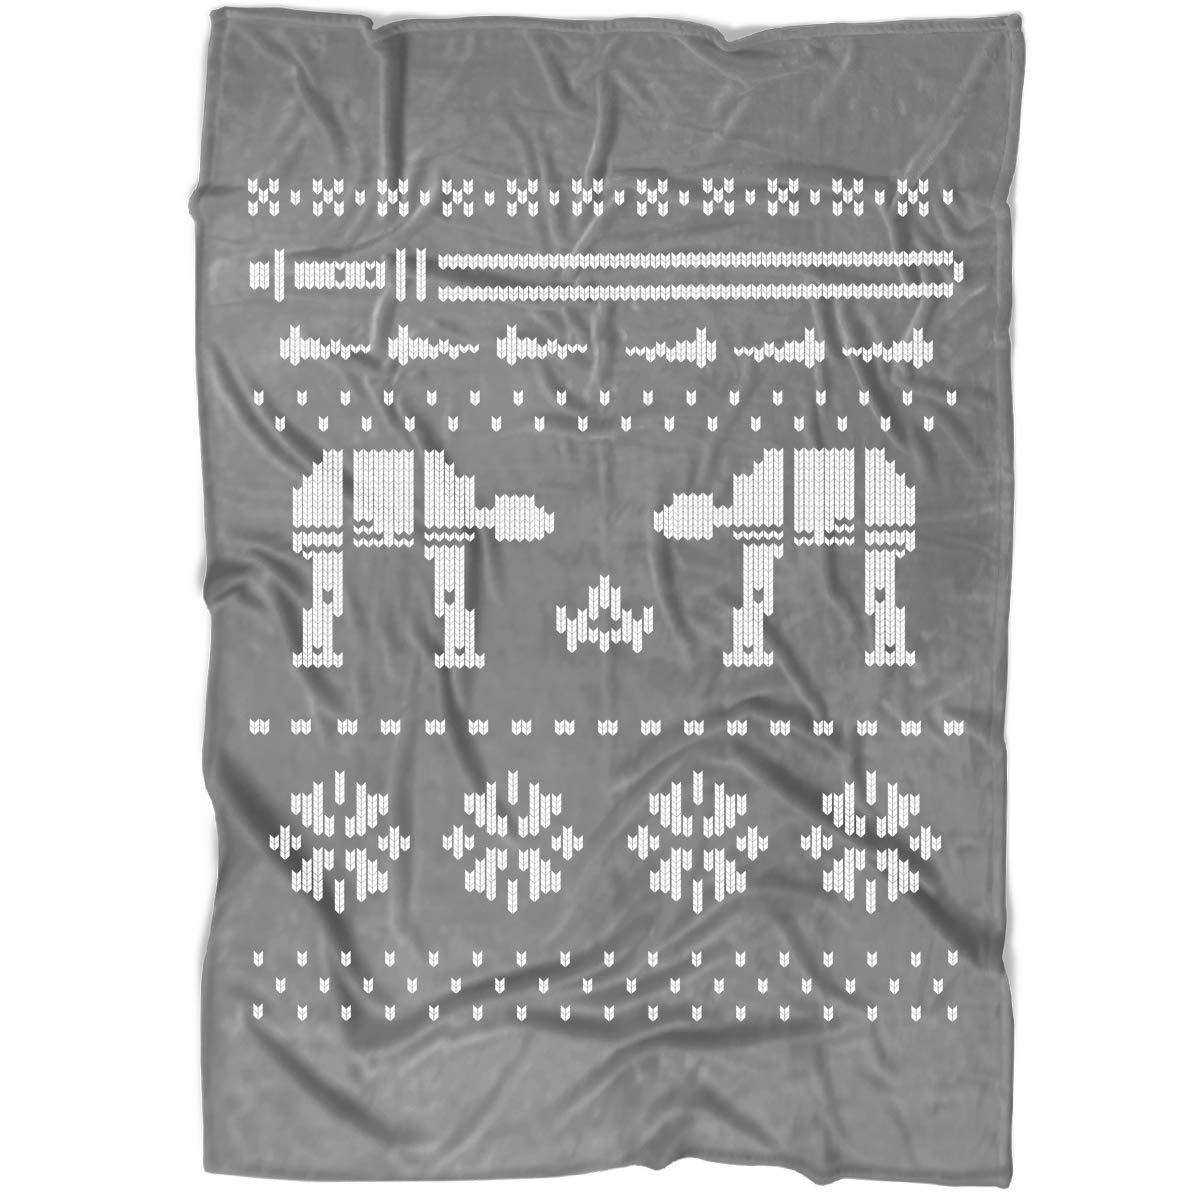 Amazon.com: UTAMUGS at at Walker Christmas Blanket for Bed ...